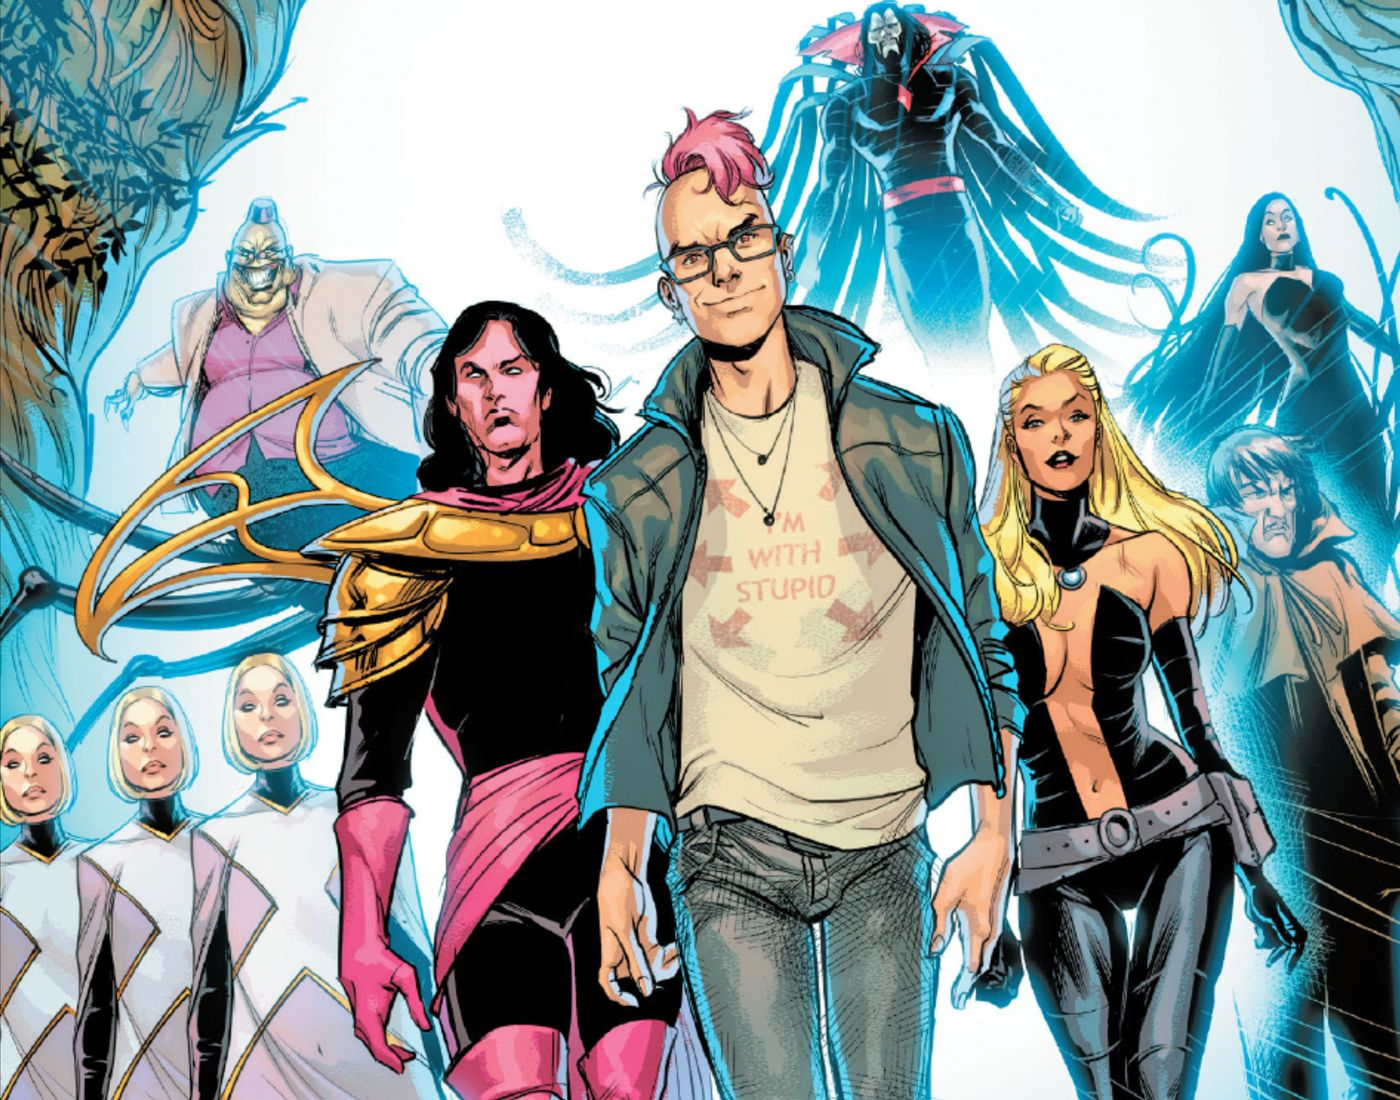 X-Men: Os novos Illuminati da Marvel já se infiltraram no Krakoa? 1